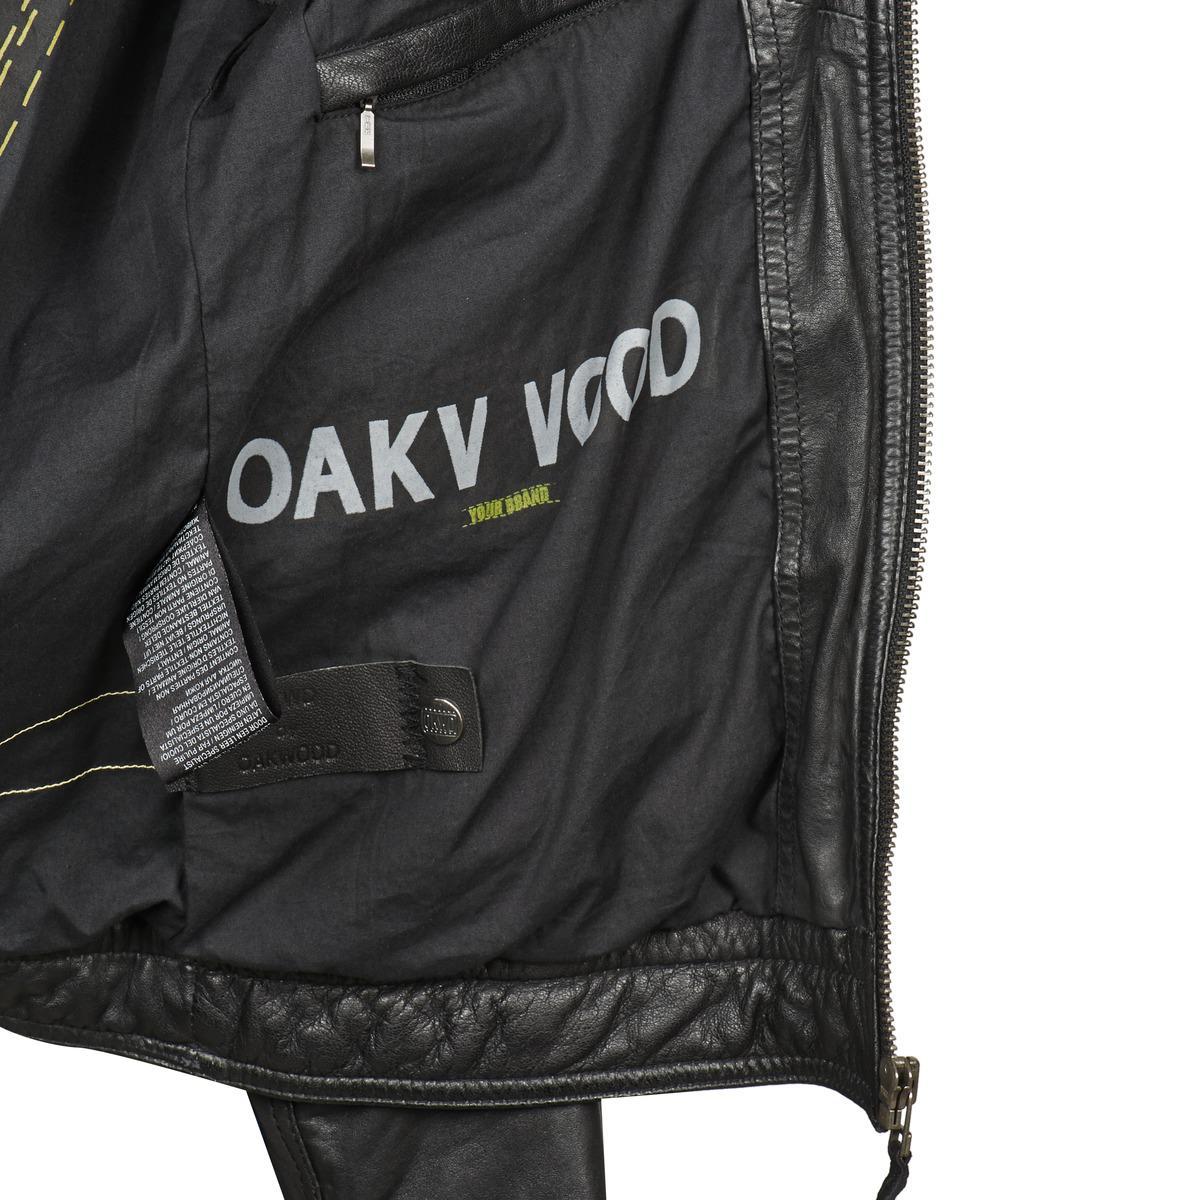 Oakwood 60574 Leather Jacket in Black for Men